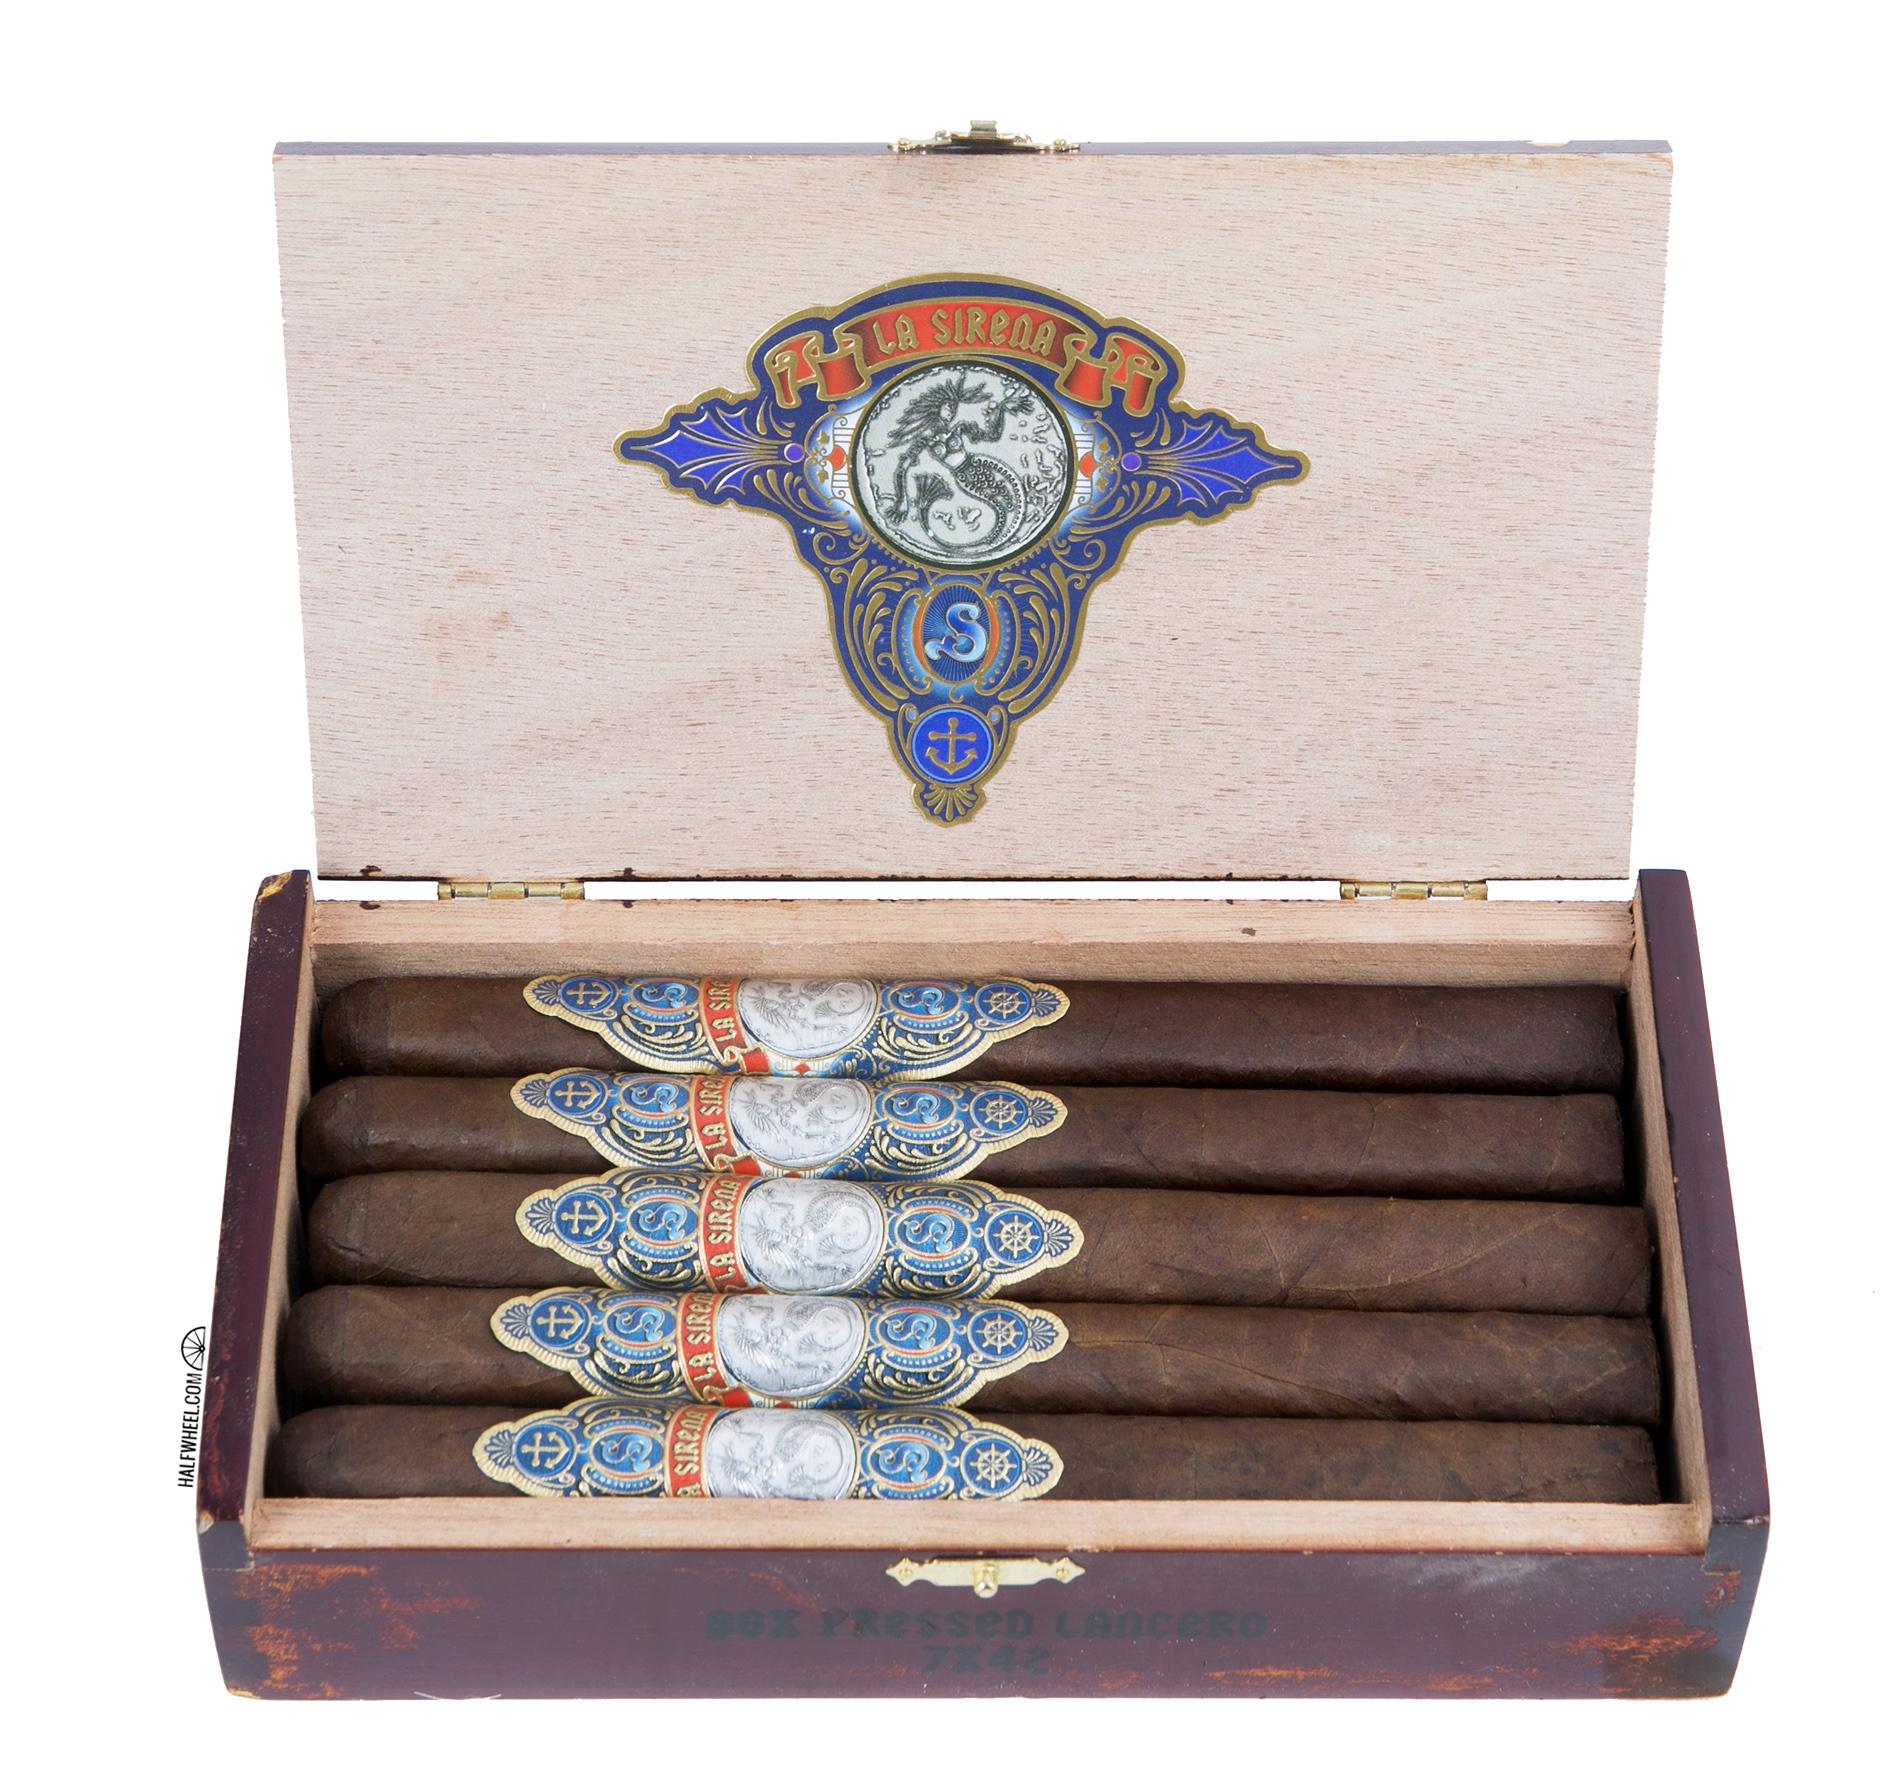 La Sirena Box-Pressed Lancero Box 2